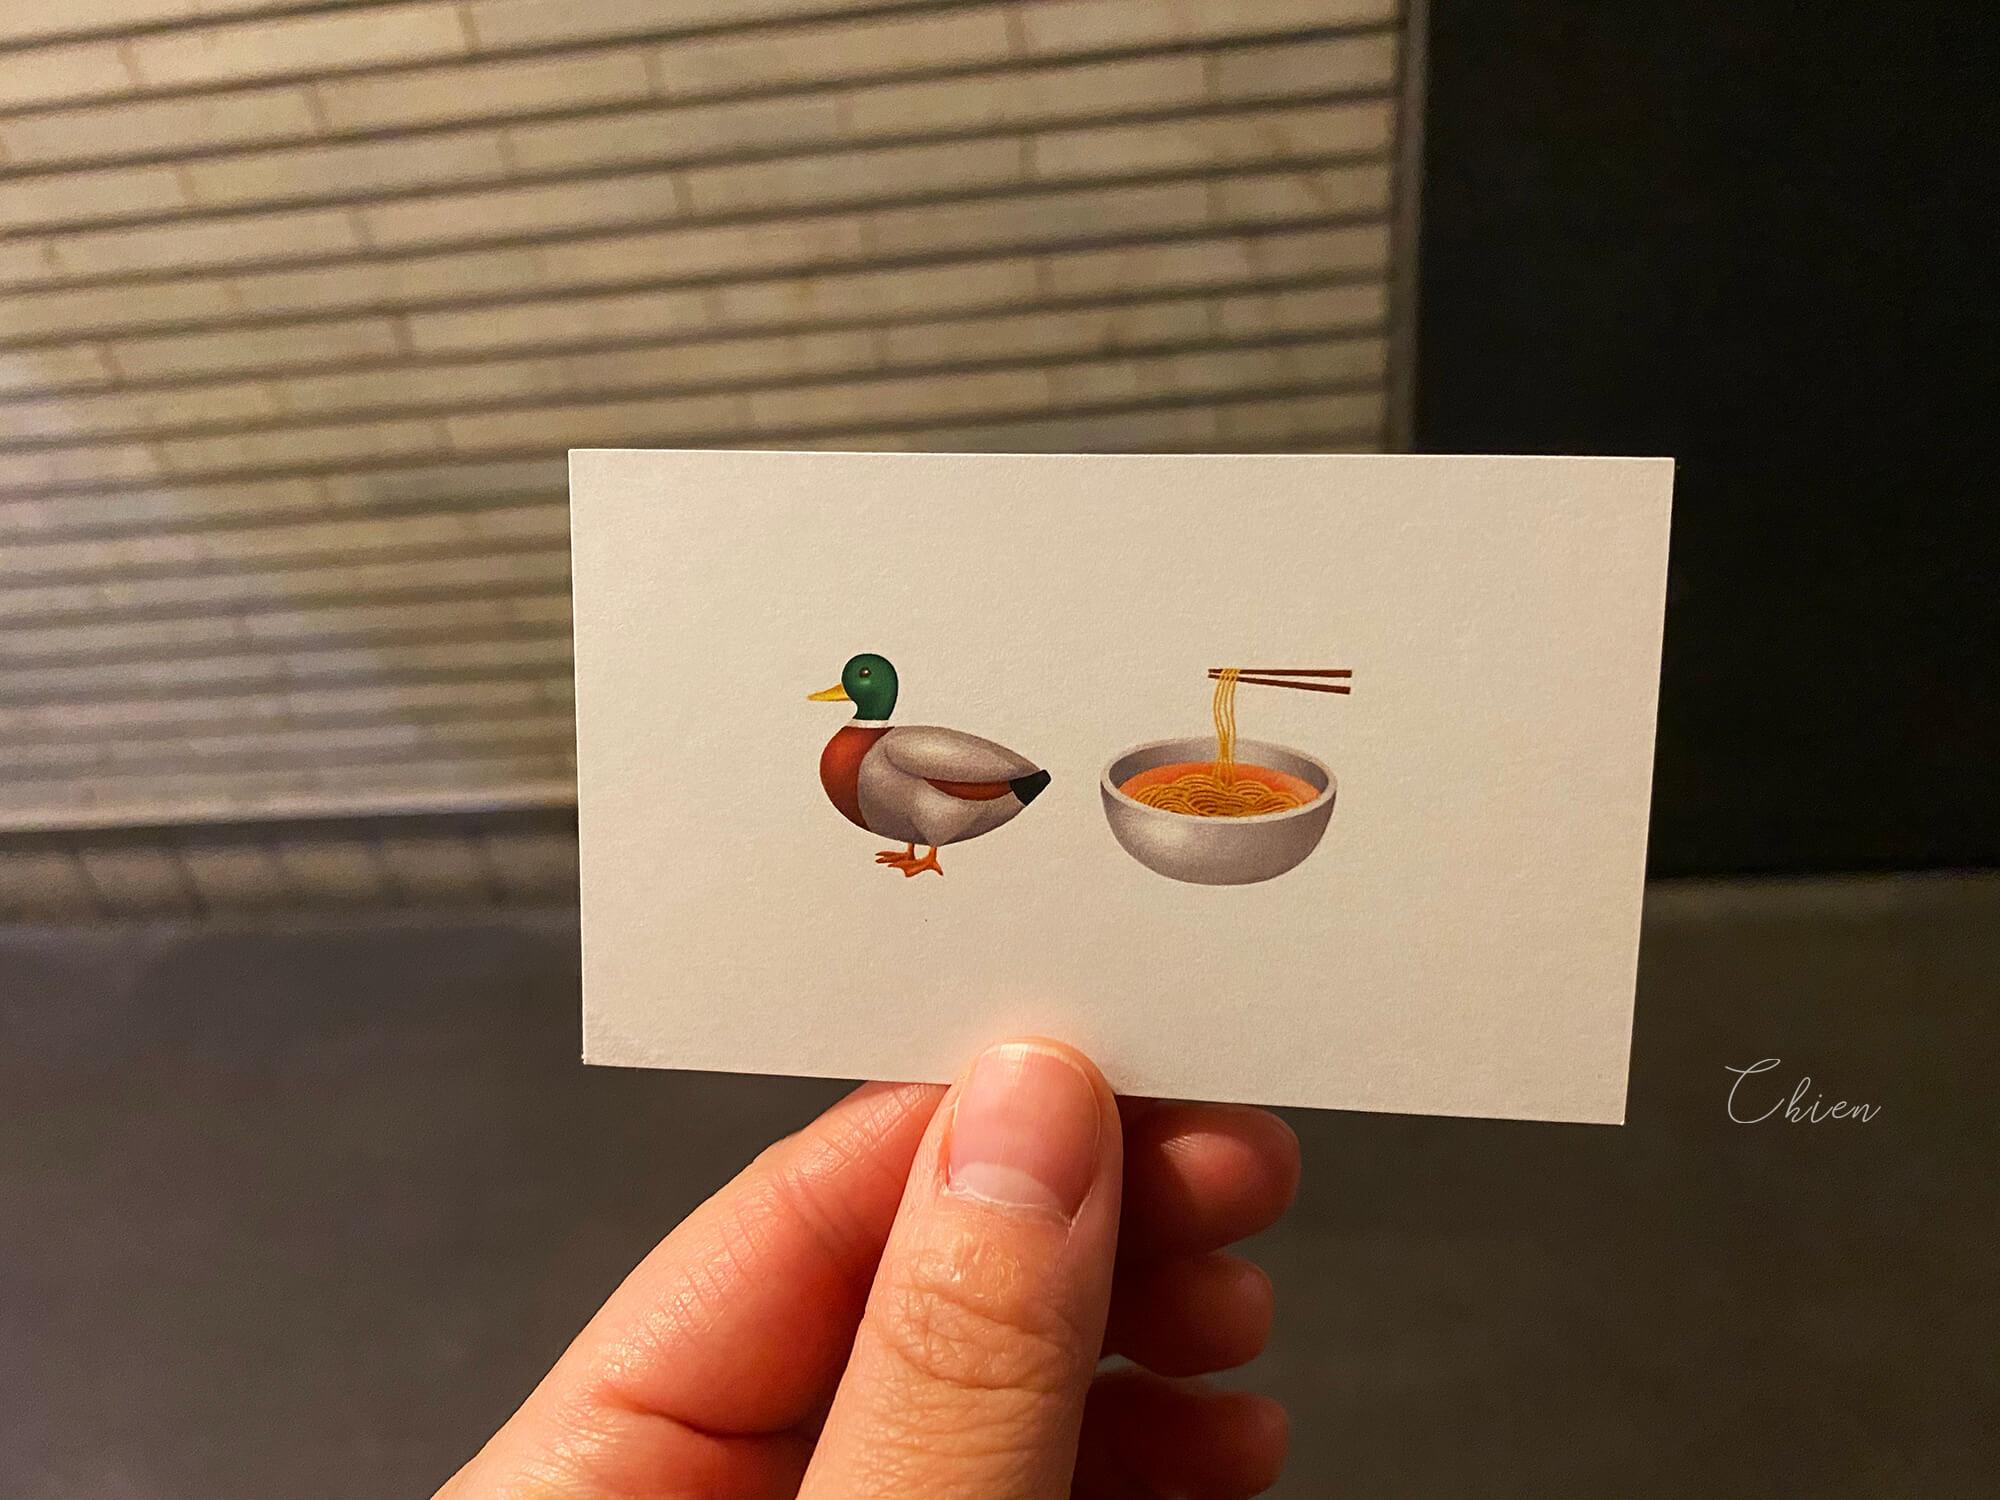 京都祇園拉麵沾麵店 Gion Duck Noodles🦆🍜